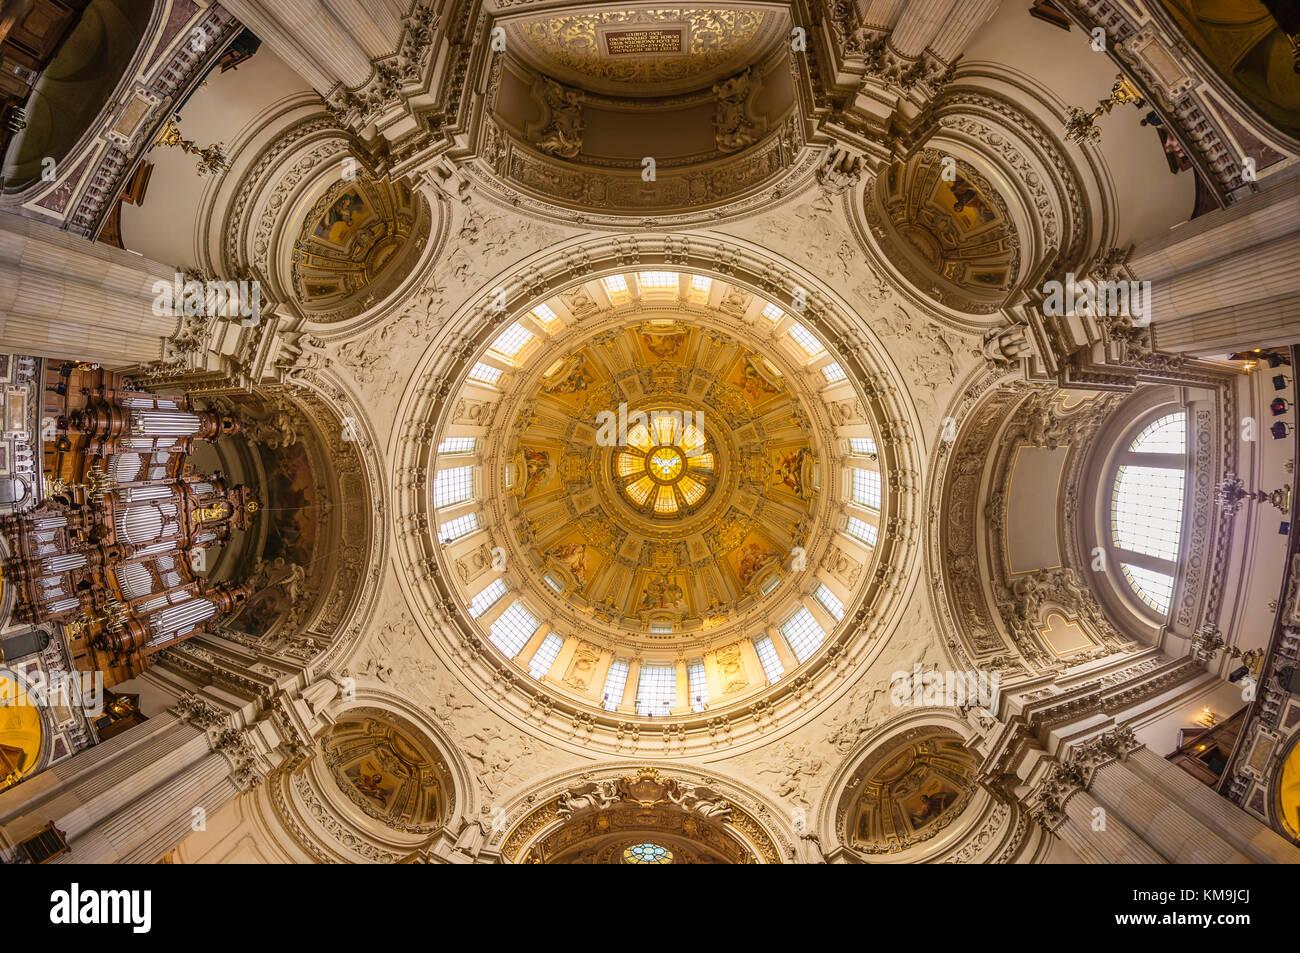 Dome Interieur, Kuppel, Berlin, Deutschland Stockbild